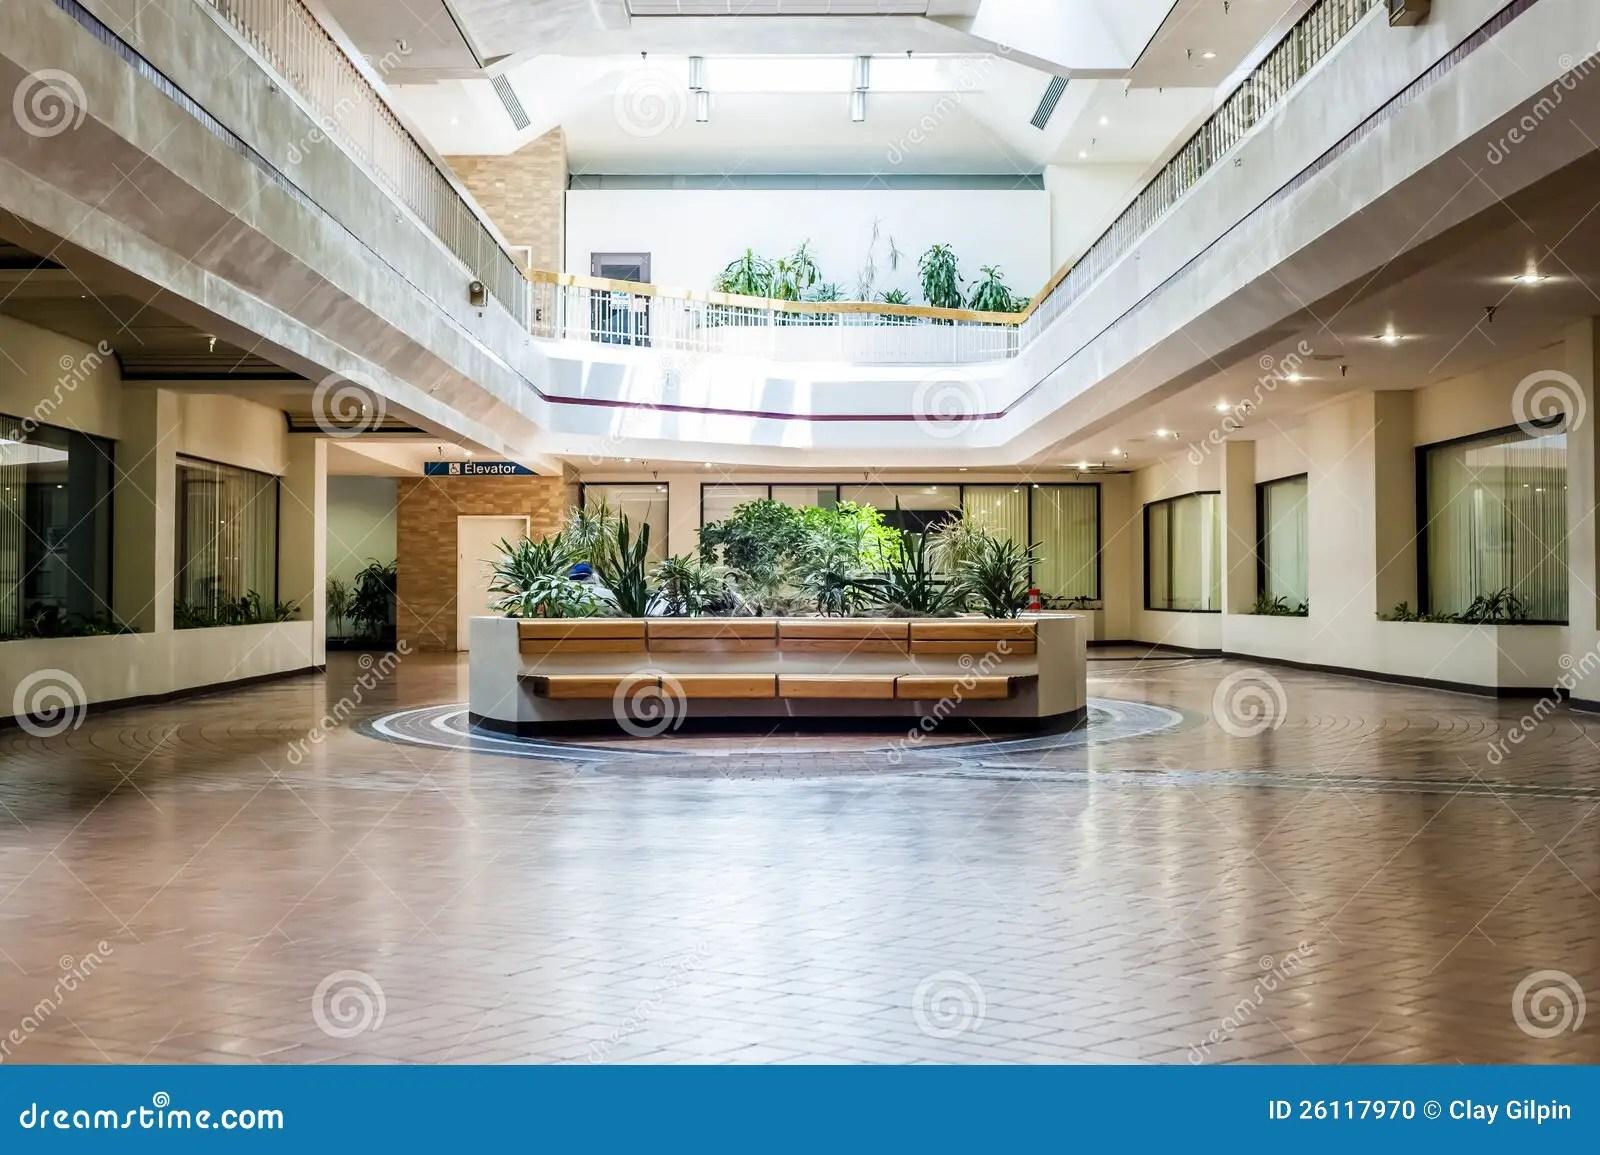 Empty Mall 2 Of 2 Stock Photo Image 26117970